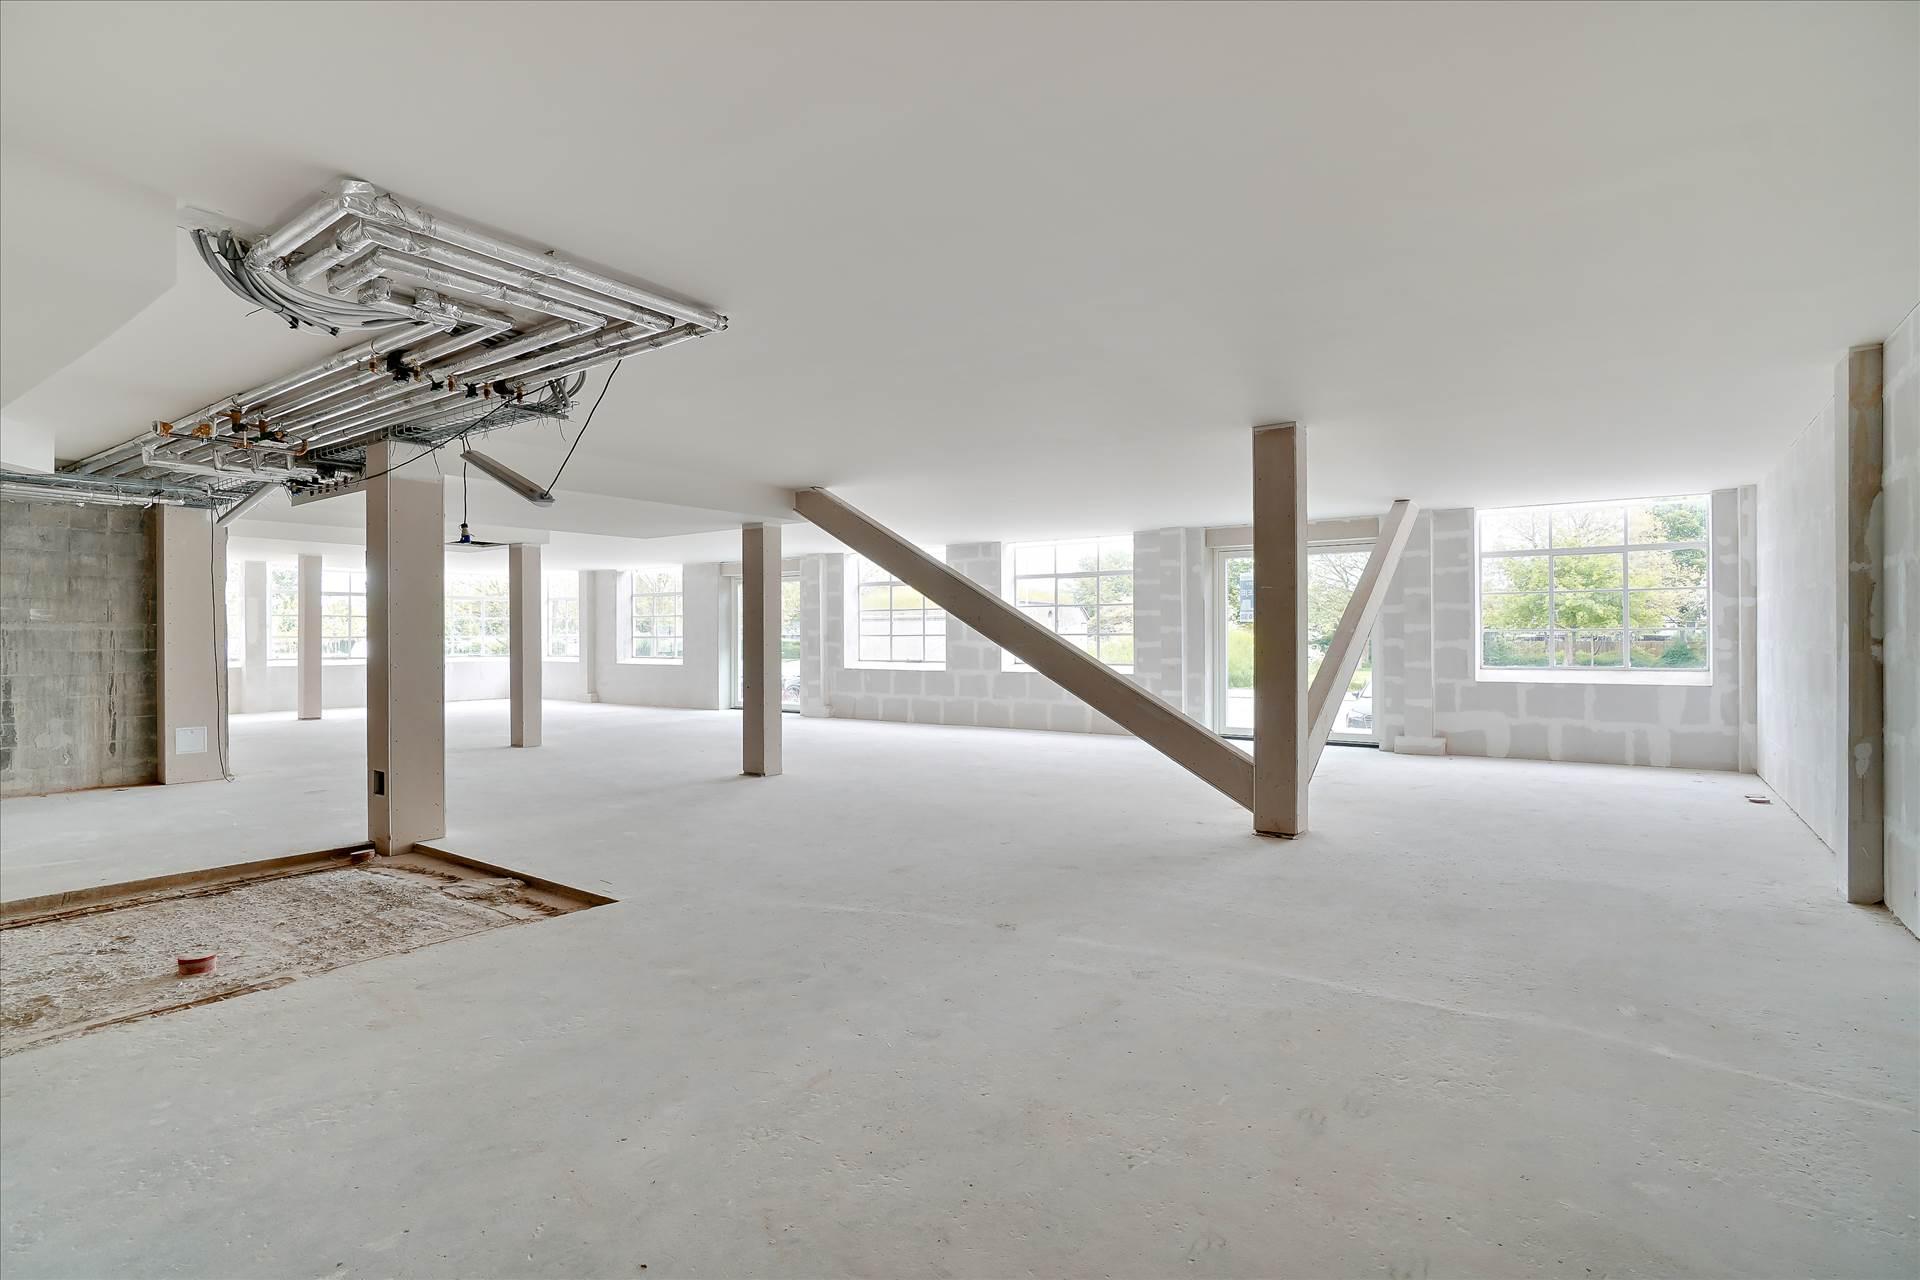 248 m² butik/café • Amager Strand